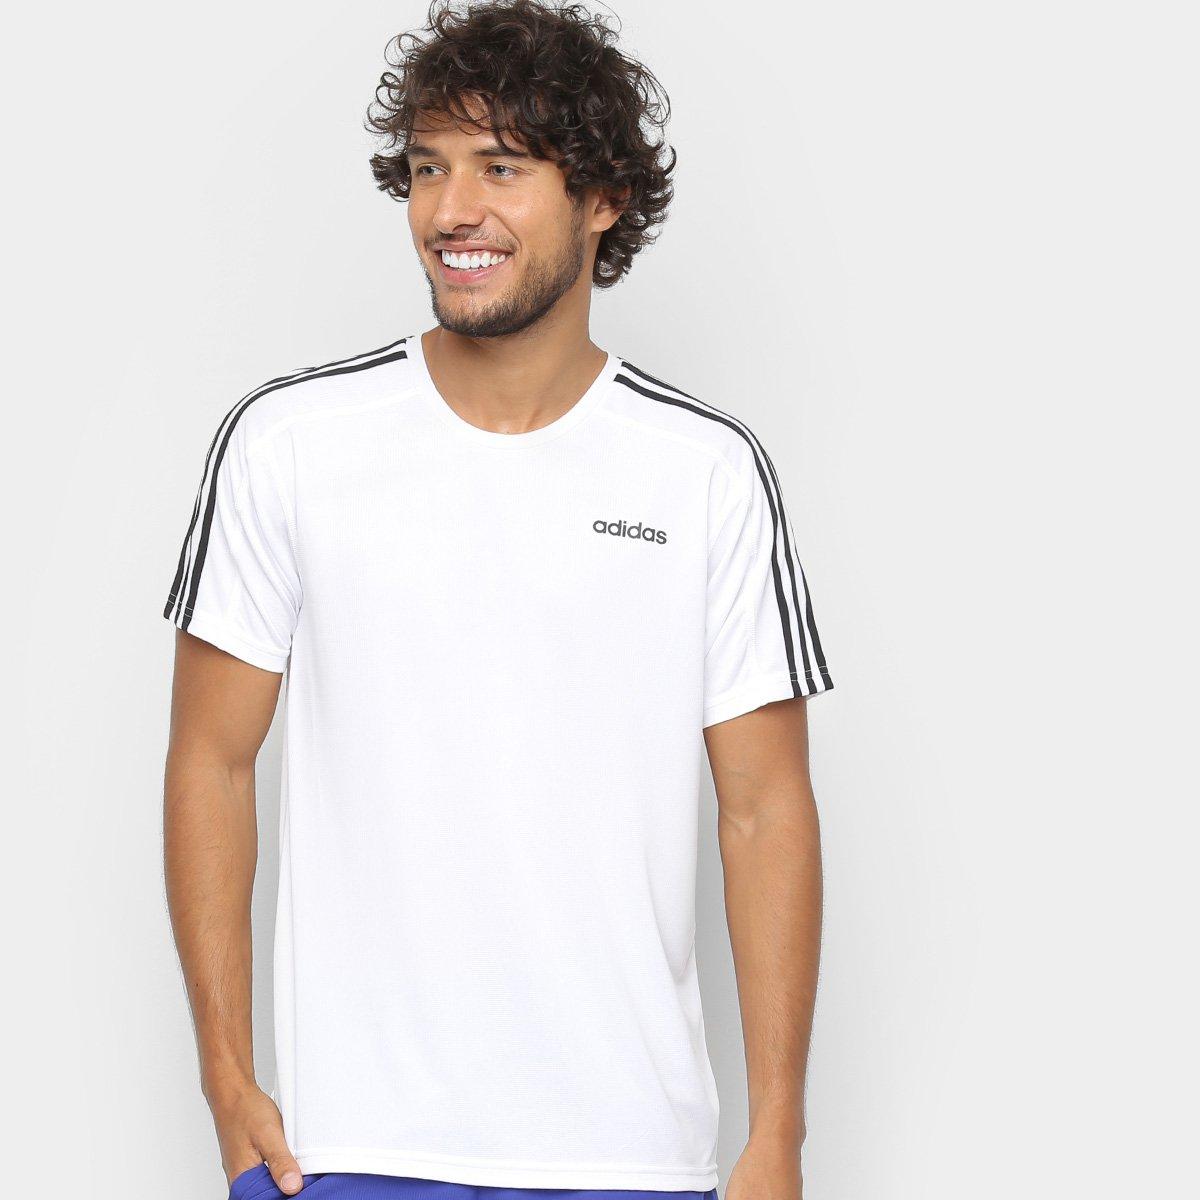 Camiseta Adidas Design 2 Move 3 Stripes Masculina - Branco - Compre ... 50448b0aa2fbd